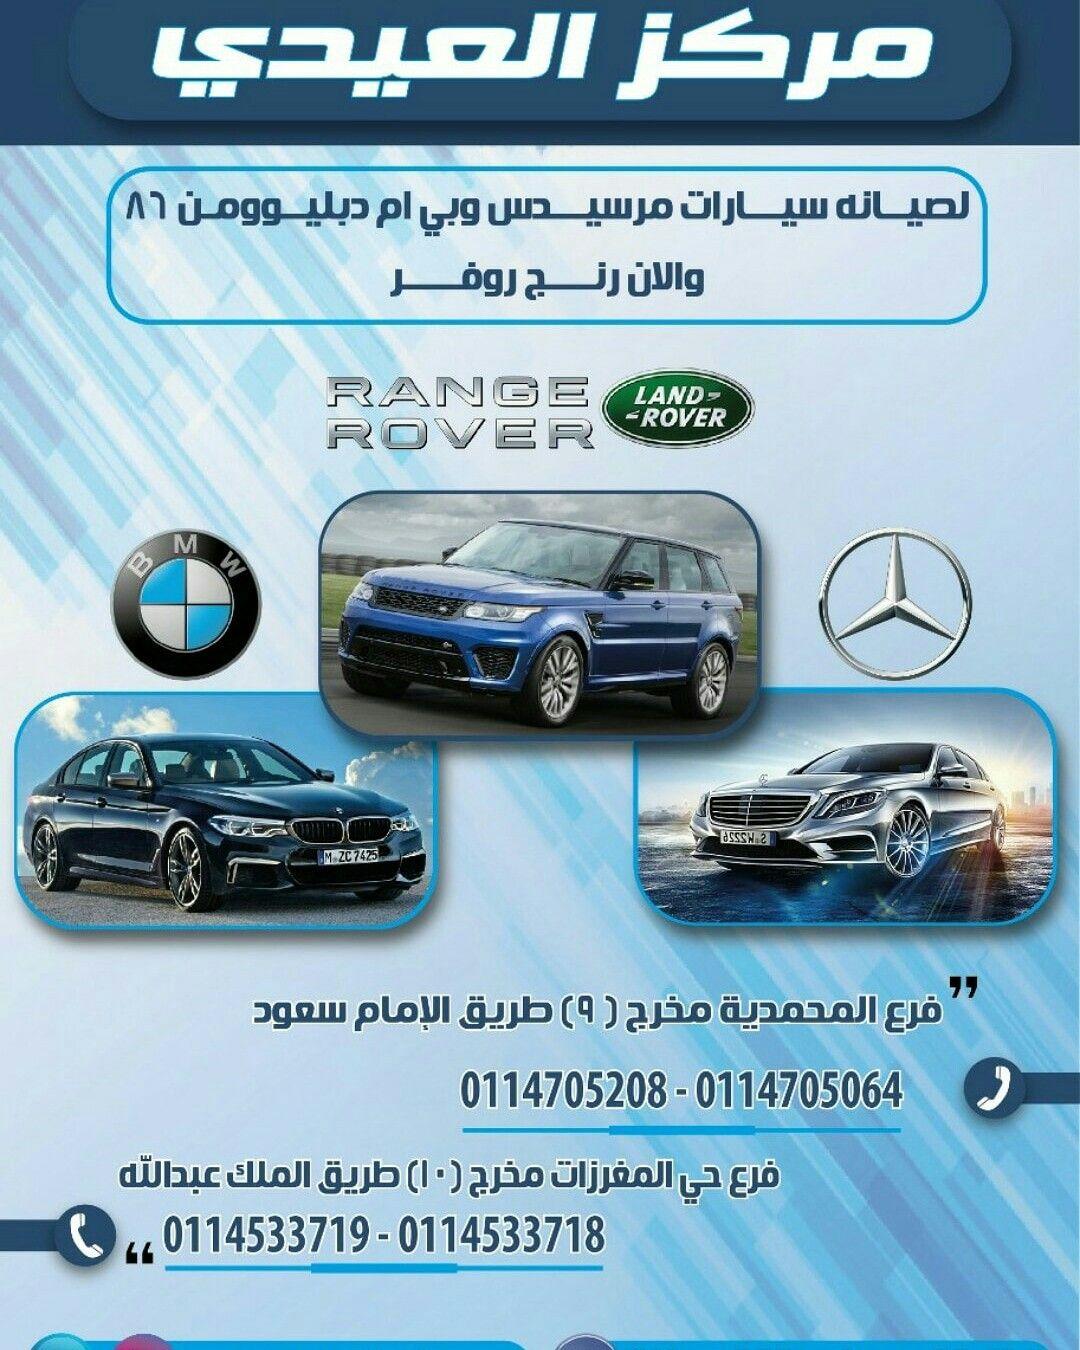 العيدي لصيانه رنج روفر 0114705064 Land Rover Mercedes G Wagon